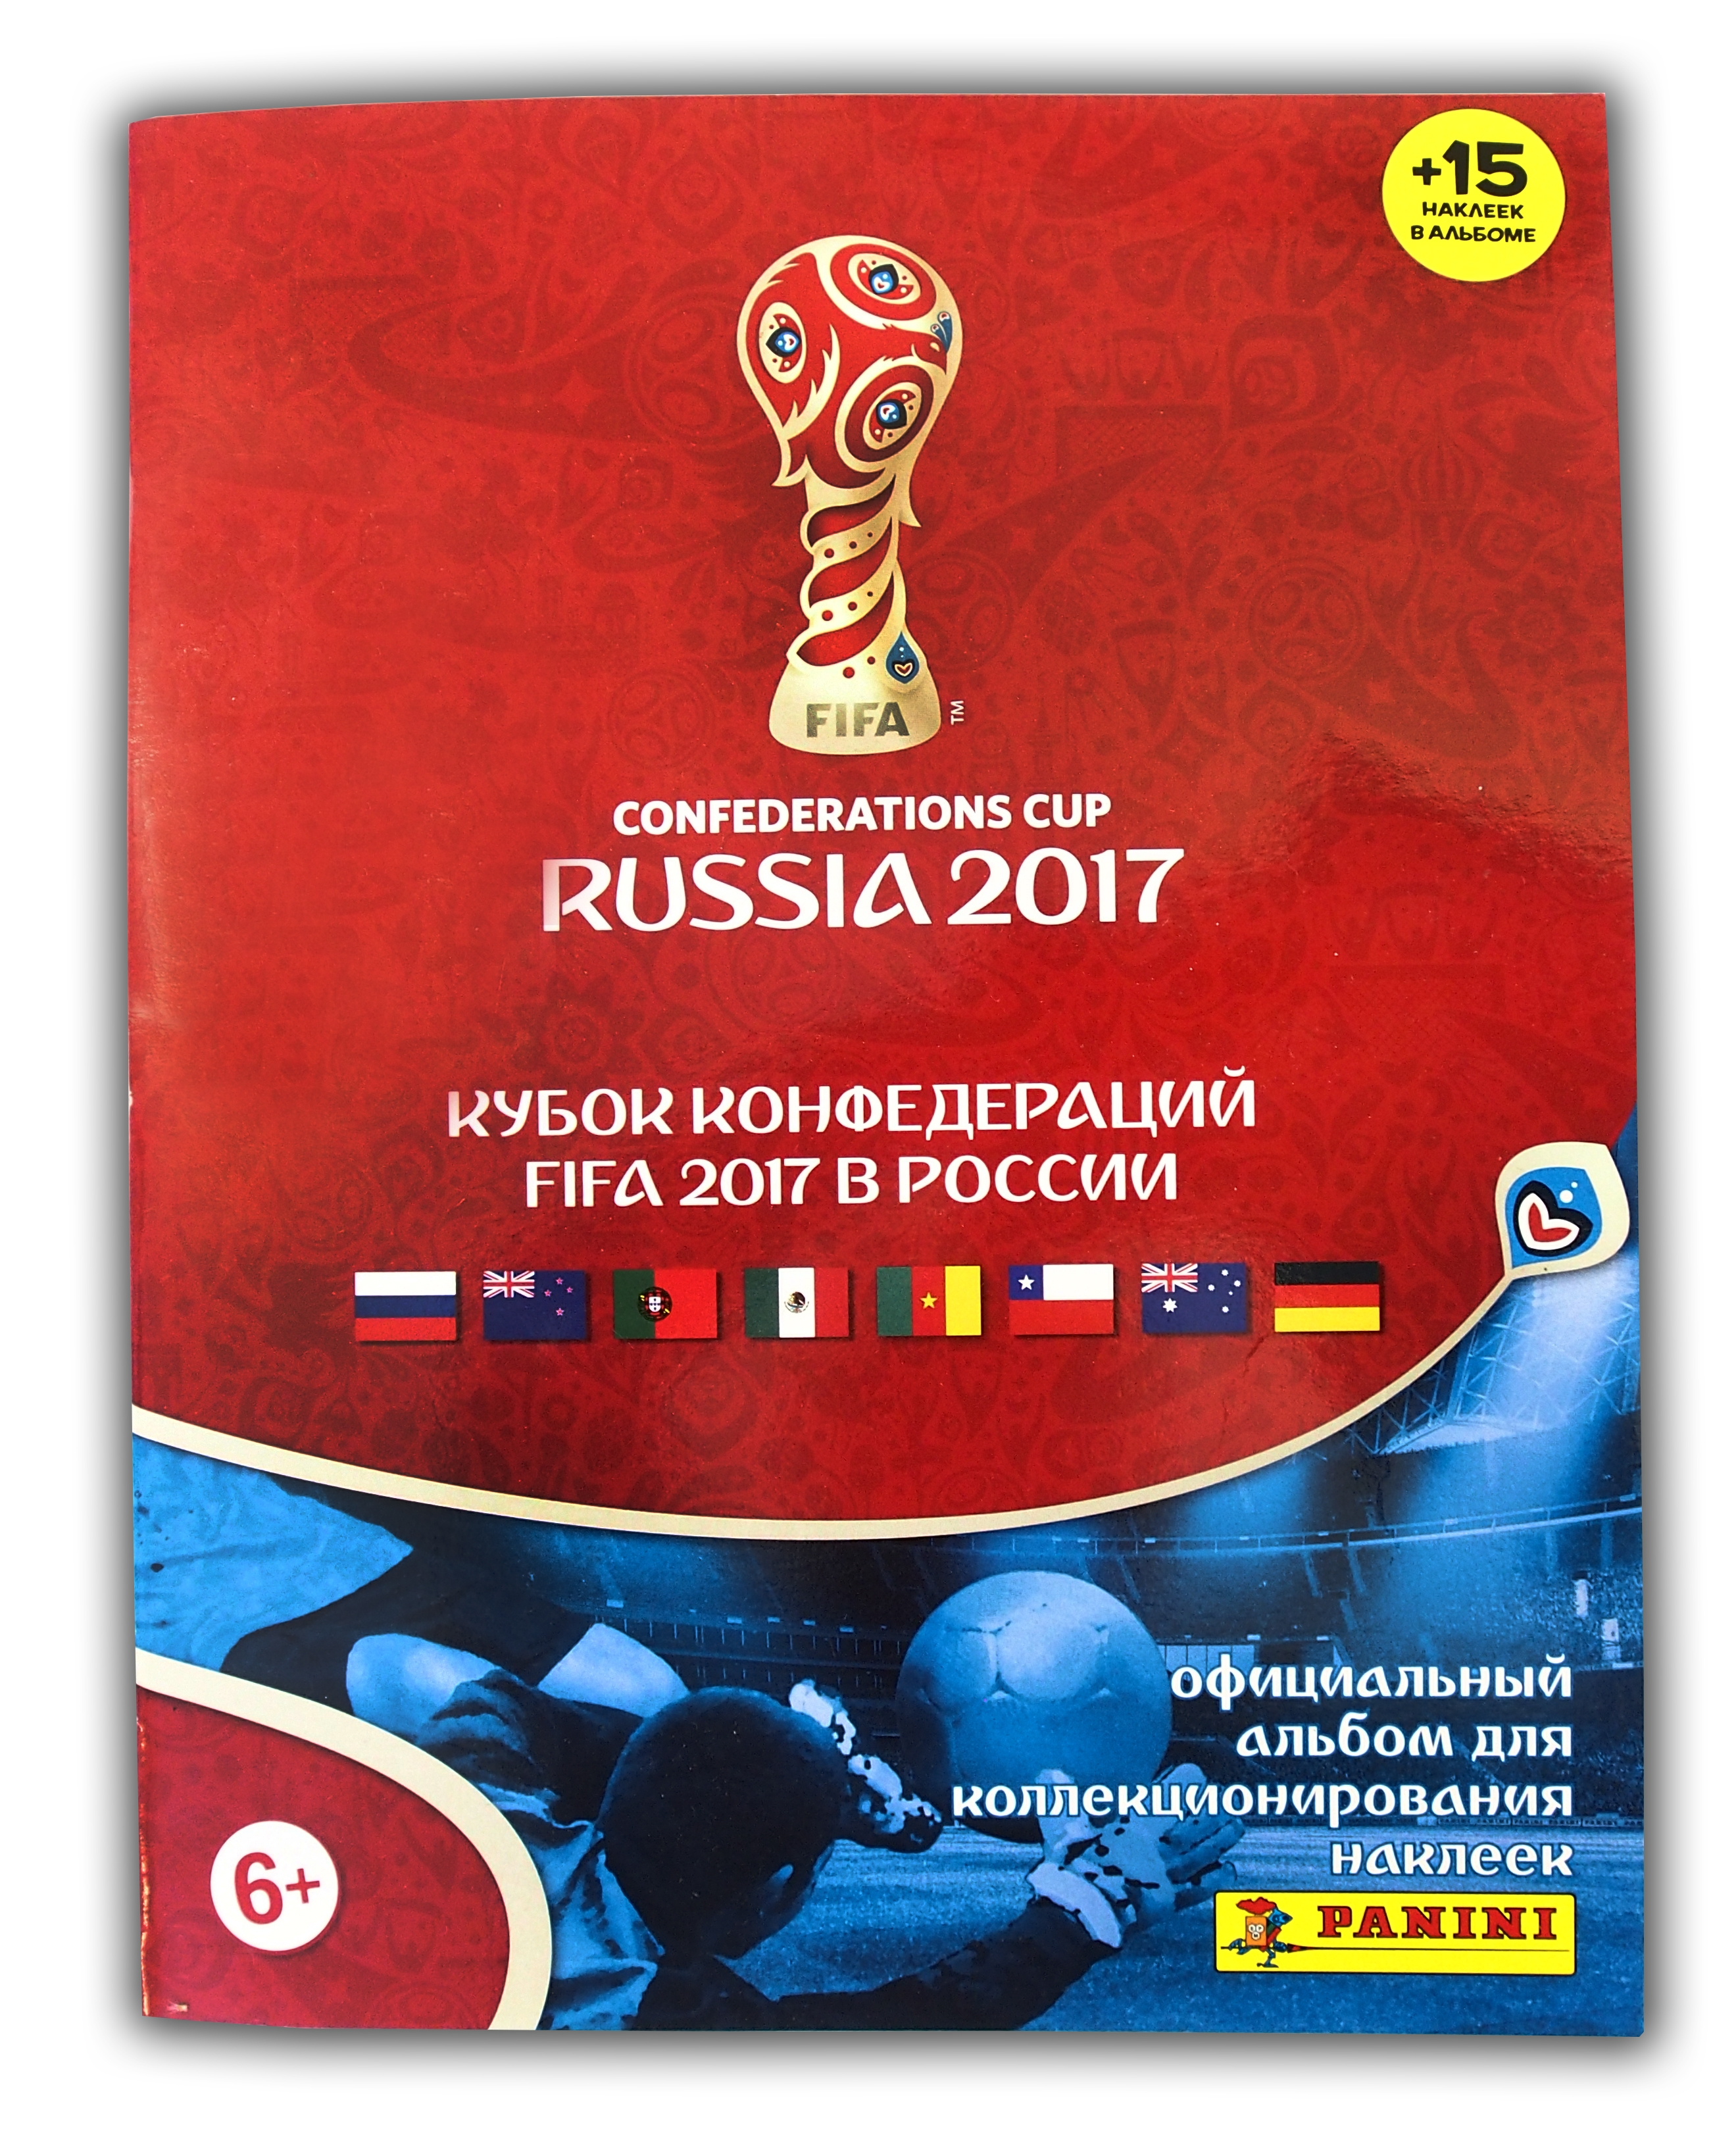 Альбом для наклеек Panini Кубок Конфедераций FIFA 2017